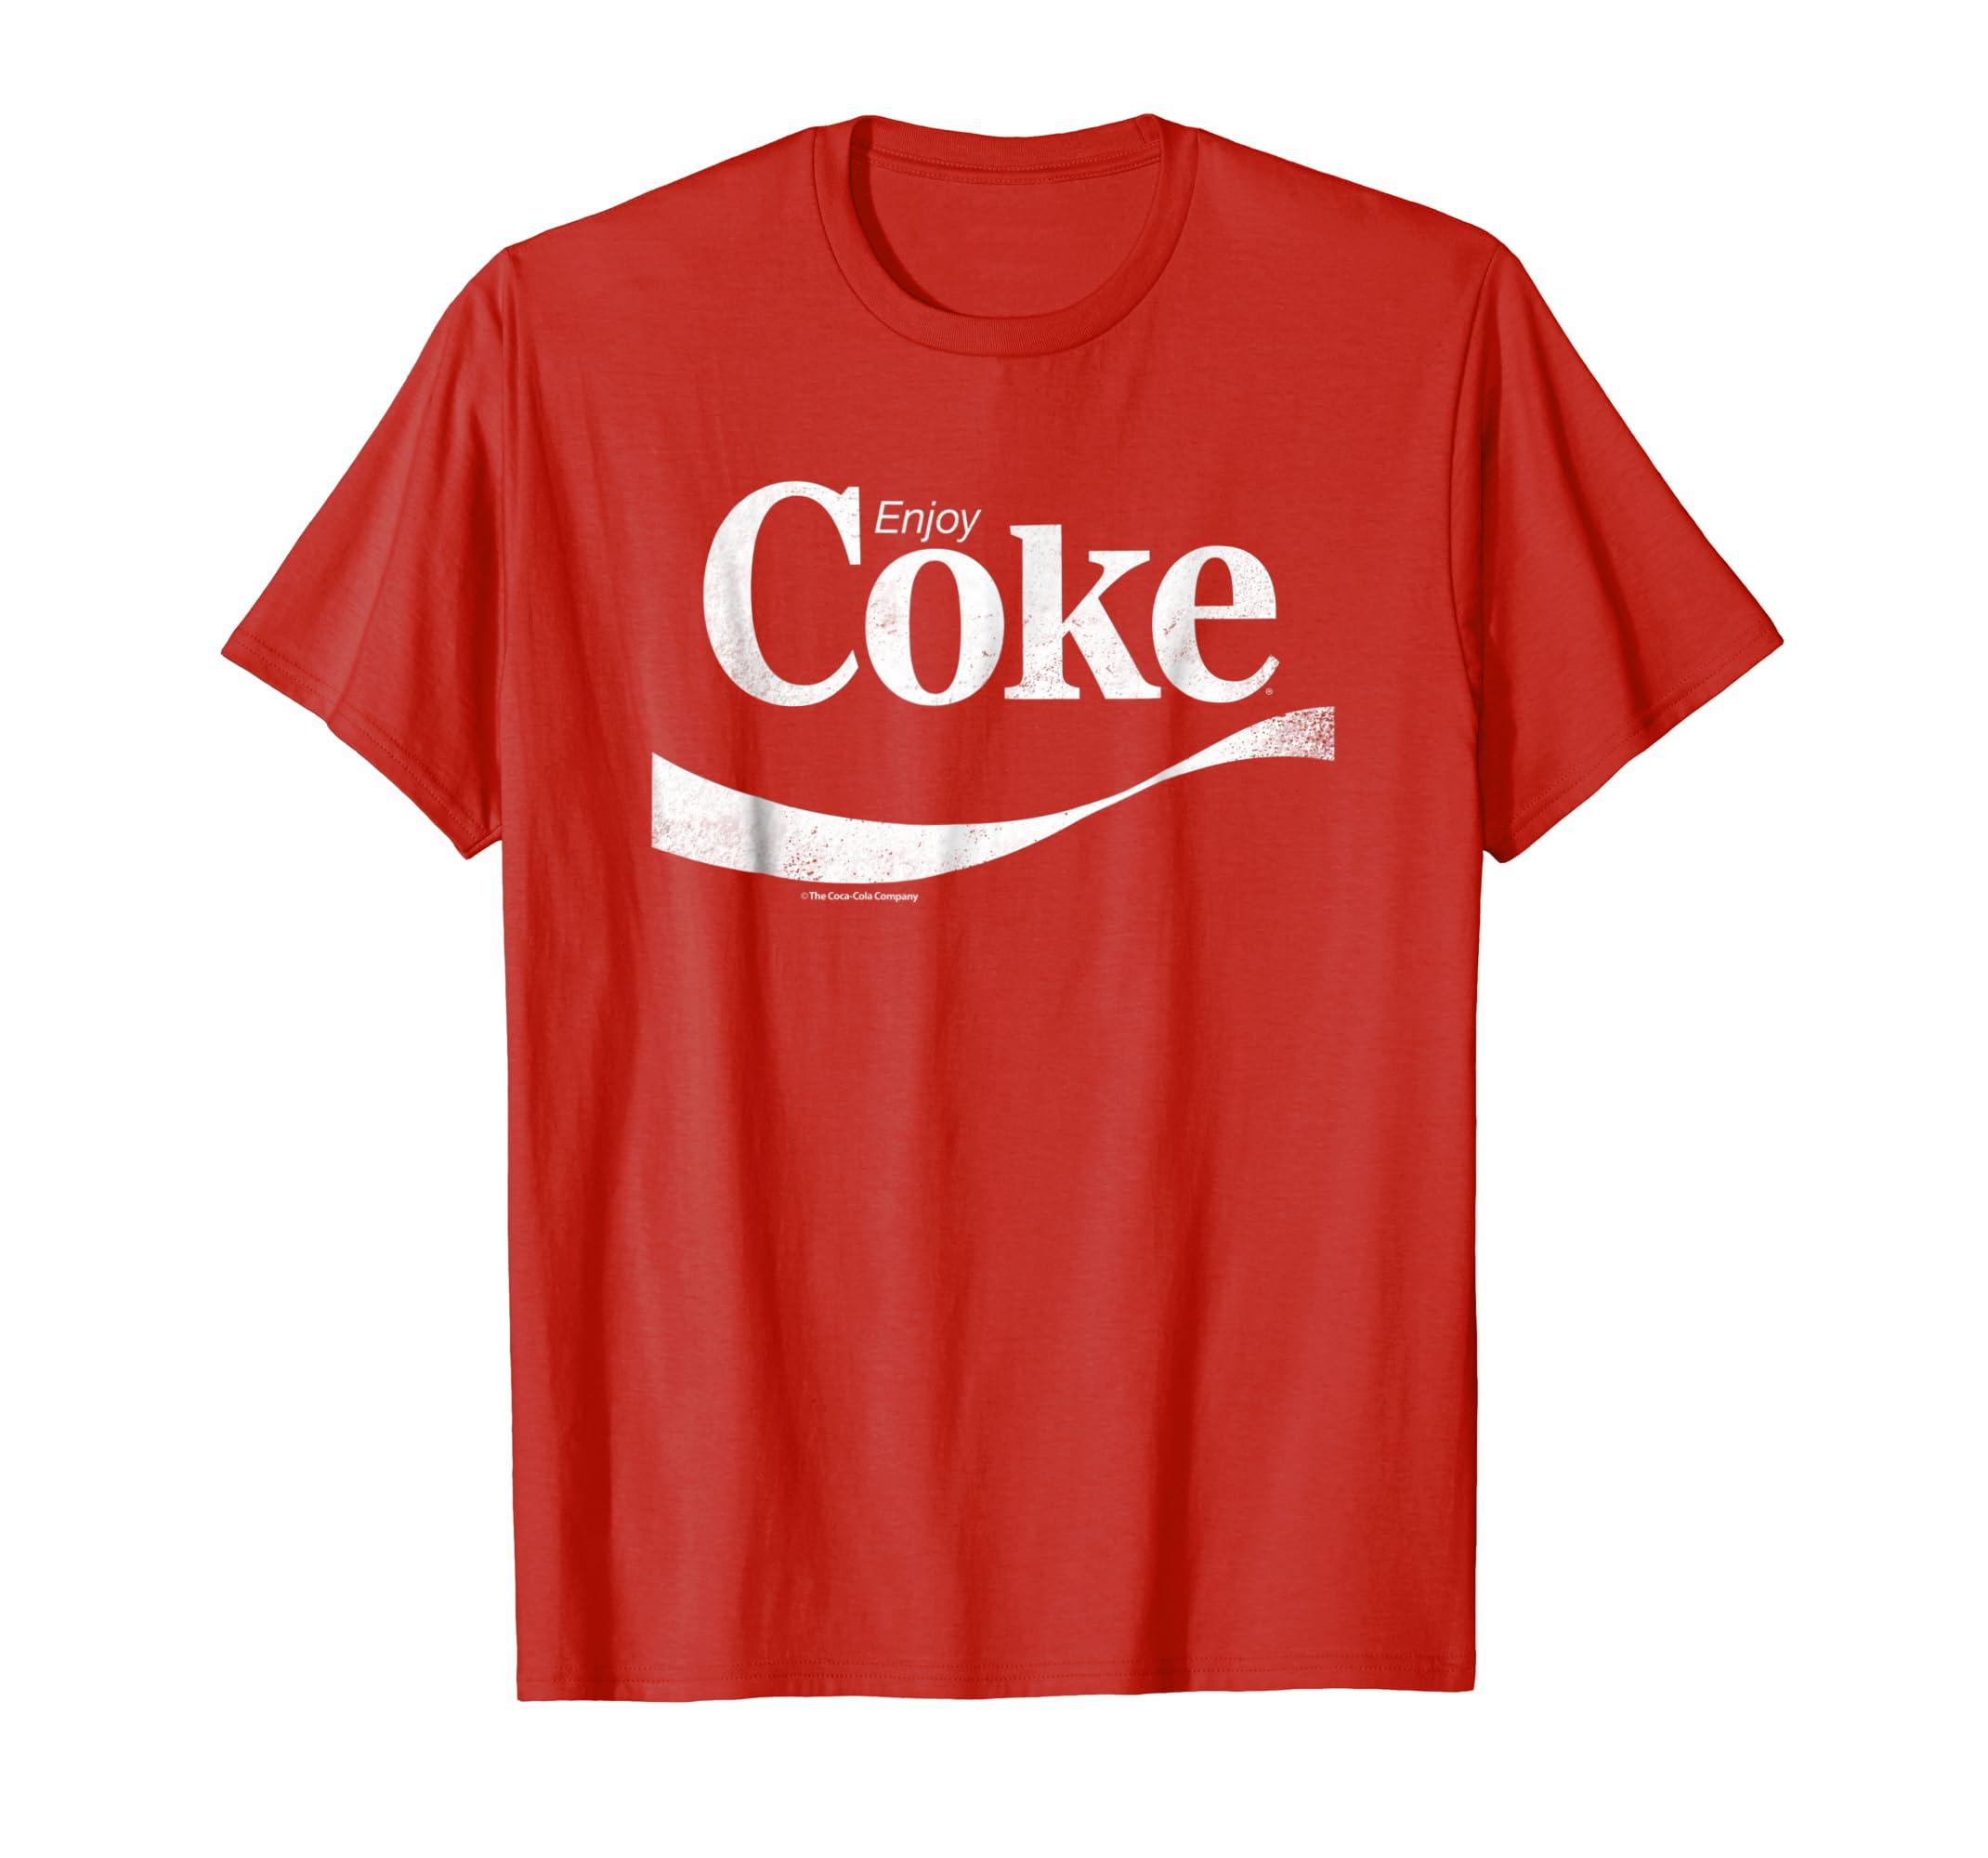 881b679949 Amazon.com: Coca-Cola Vintage Enjoy Coke White Logo Graphic T-Shirt:  Clothing